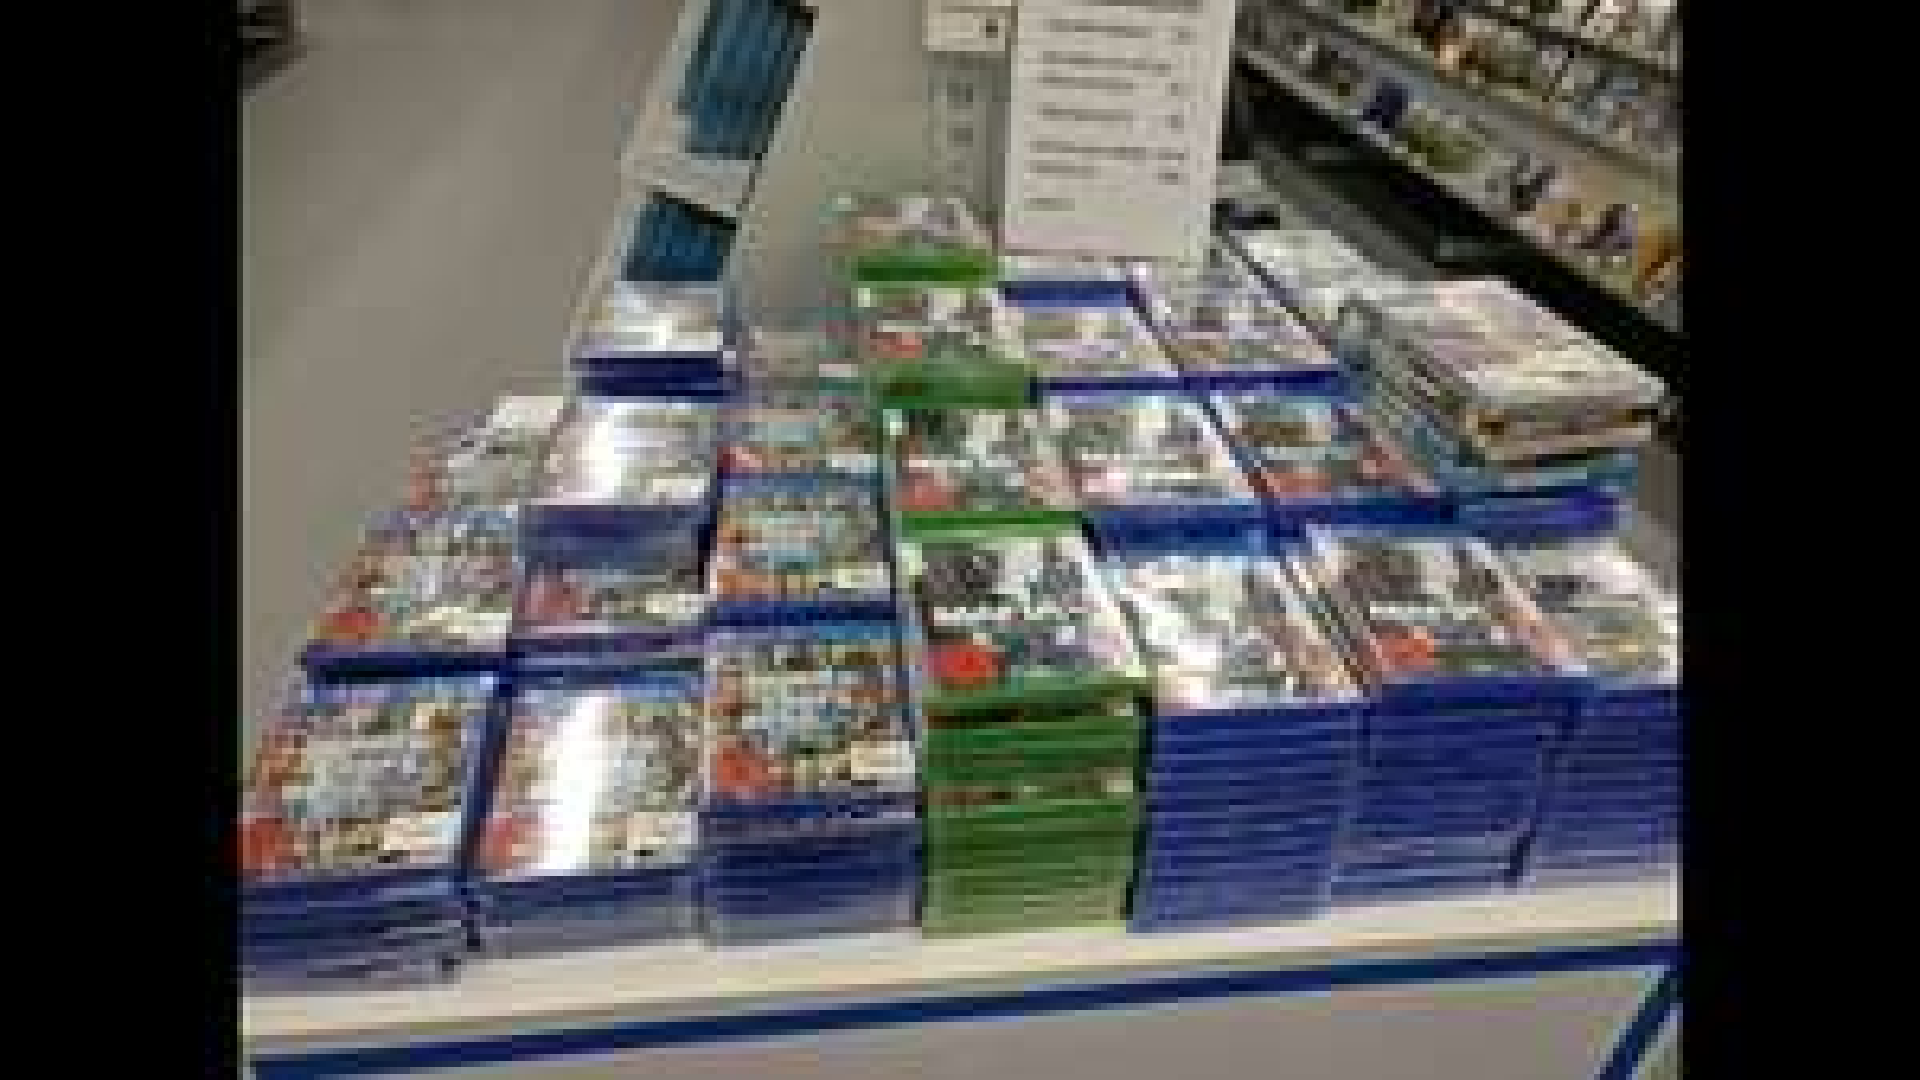 [Lokal] Saturn Braunschweig PS4/XBO Mafia 3, call of duty IW, GTA 5